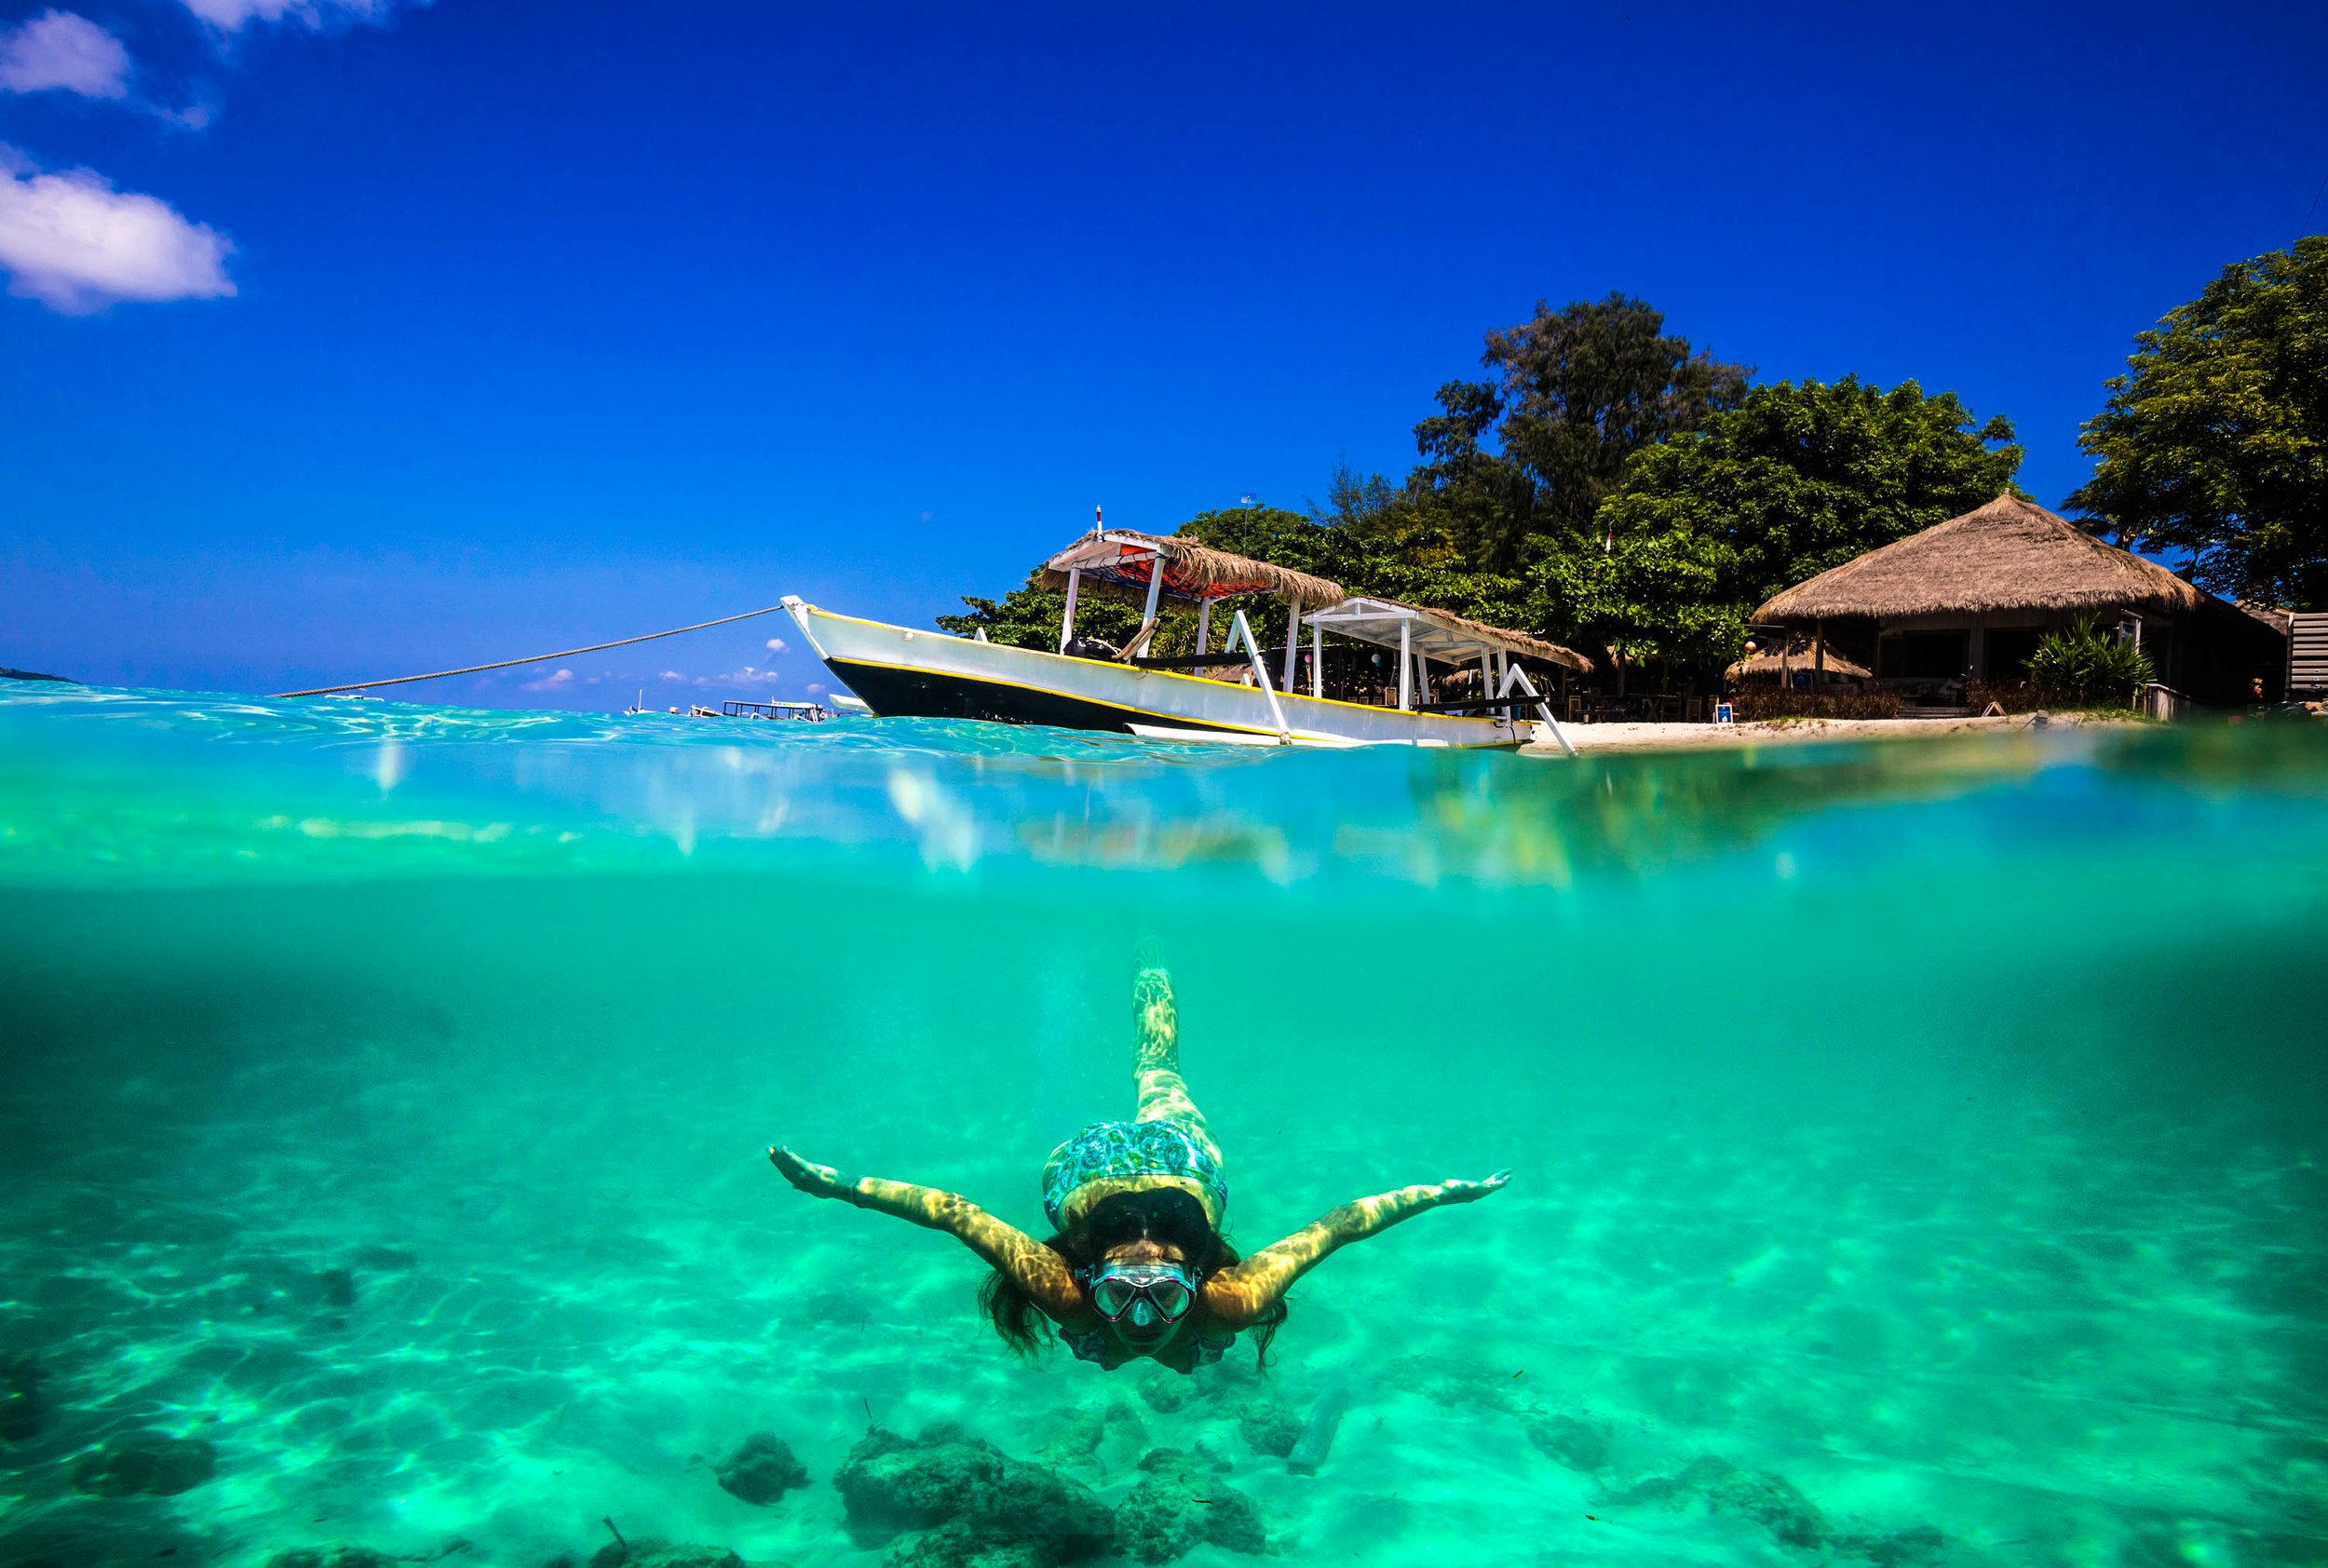 Bali-Diving-Beach-iStock_000062843628_Large-2.jpg